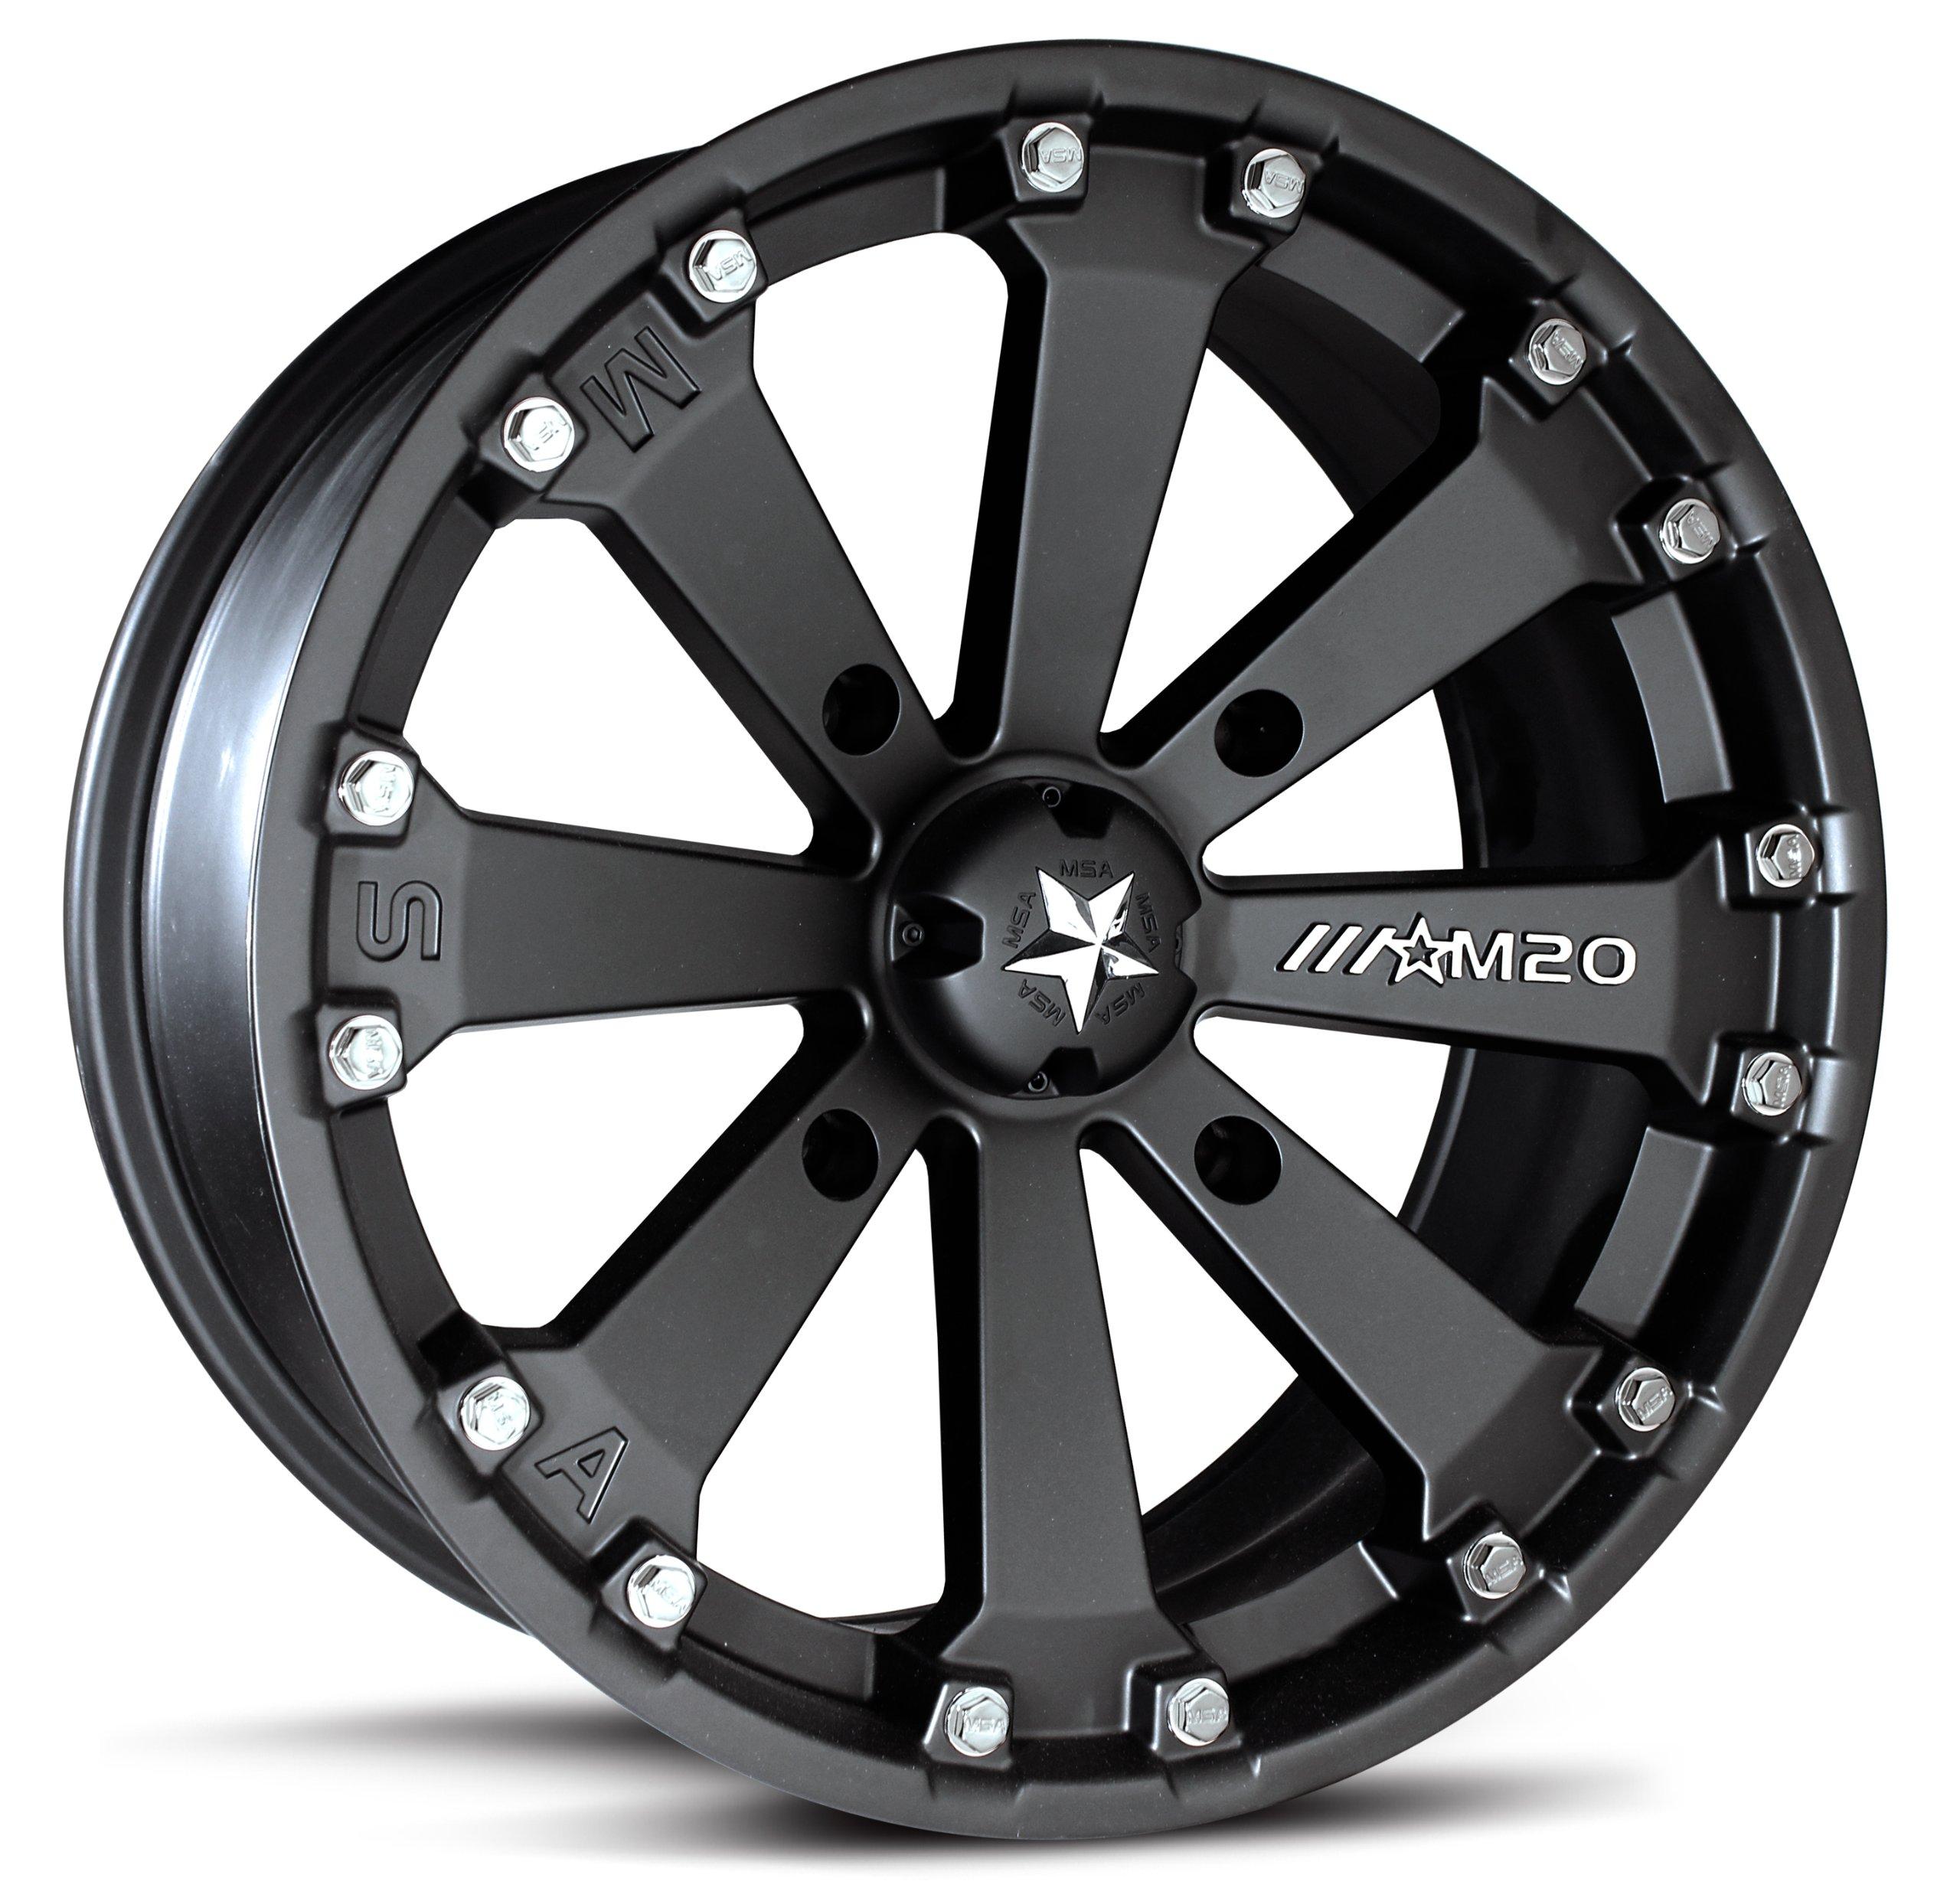 MotoSport Alloys M20 Kore ATV/UTV Wheel with Flat Black Finish (14x7/4x156mm) by MotoSport Alloys (Image #1)